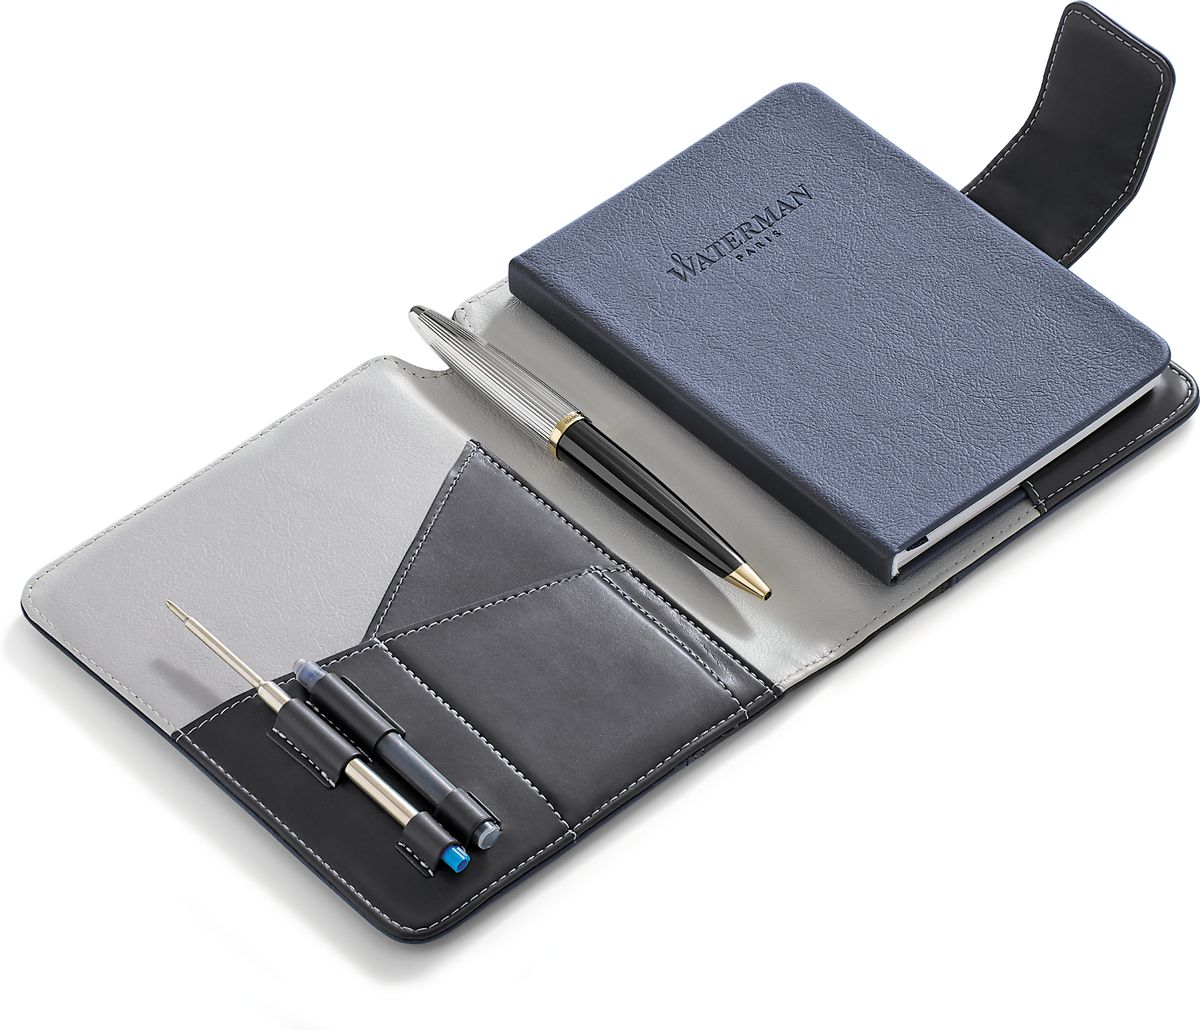 Waterman Шариковая ручка Carene Deluxe Black GT с блокнотом waterman шариковая ручка waterman s0920670